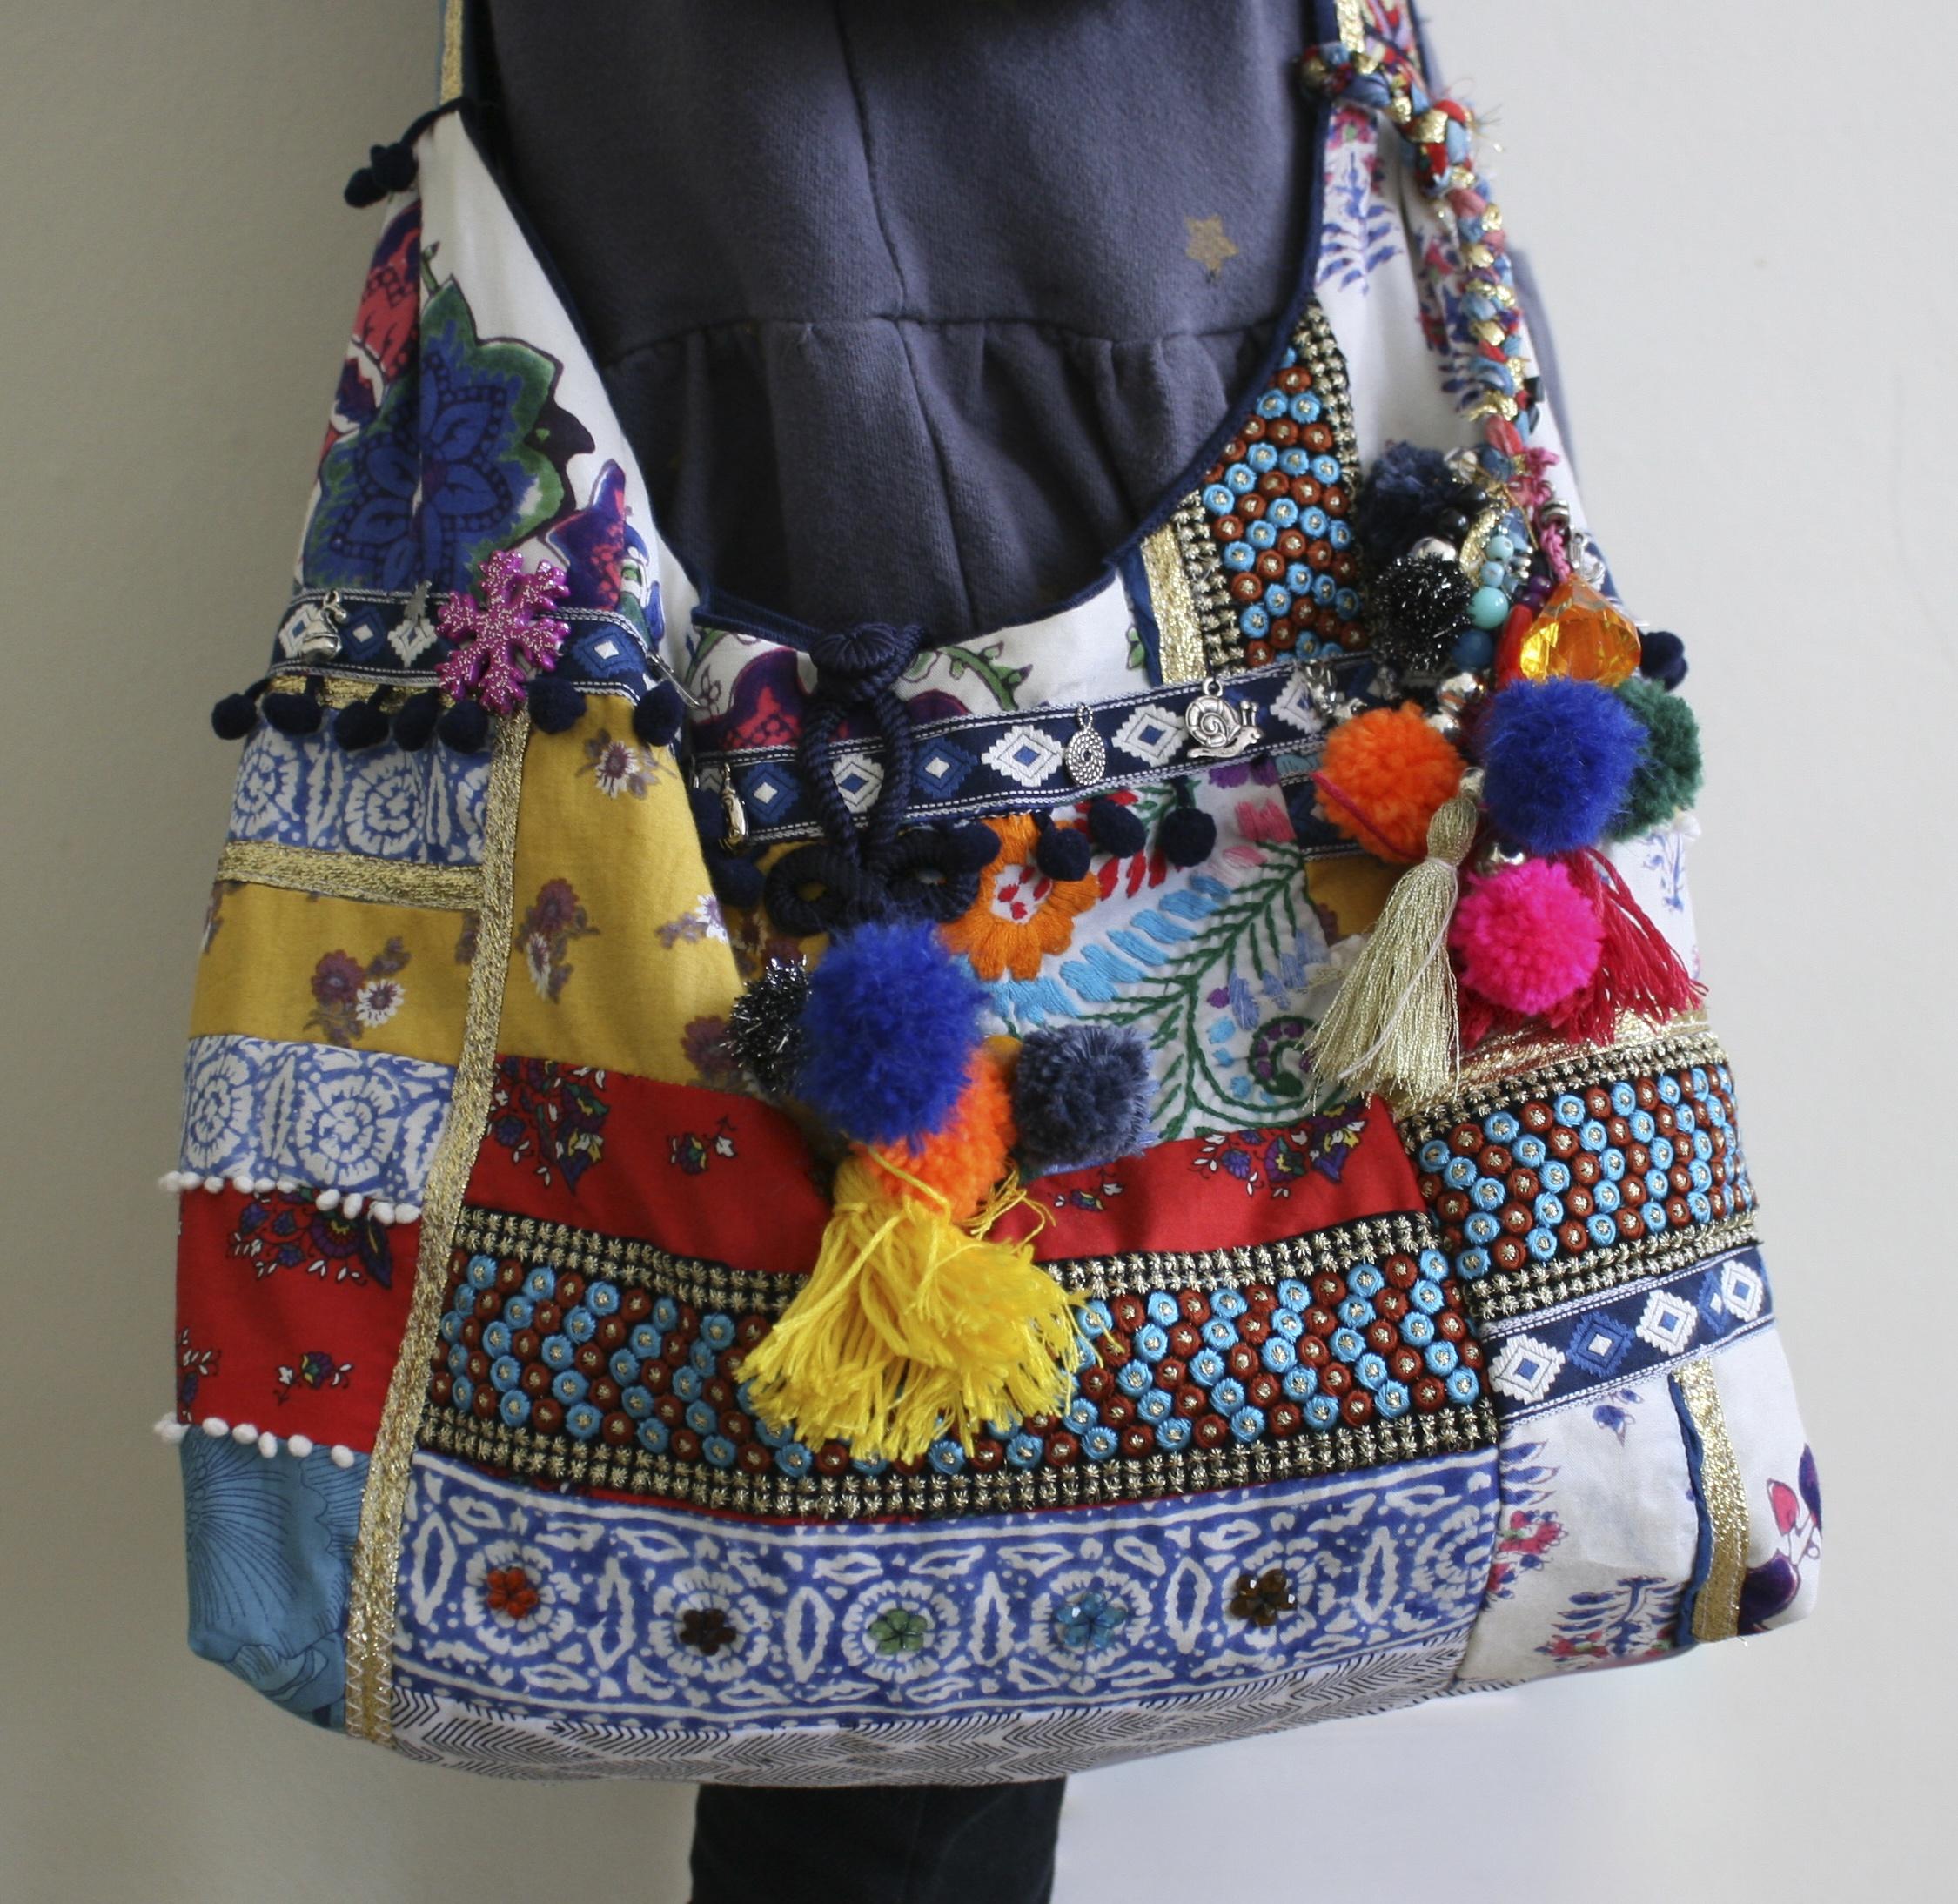 Toya's bag